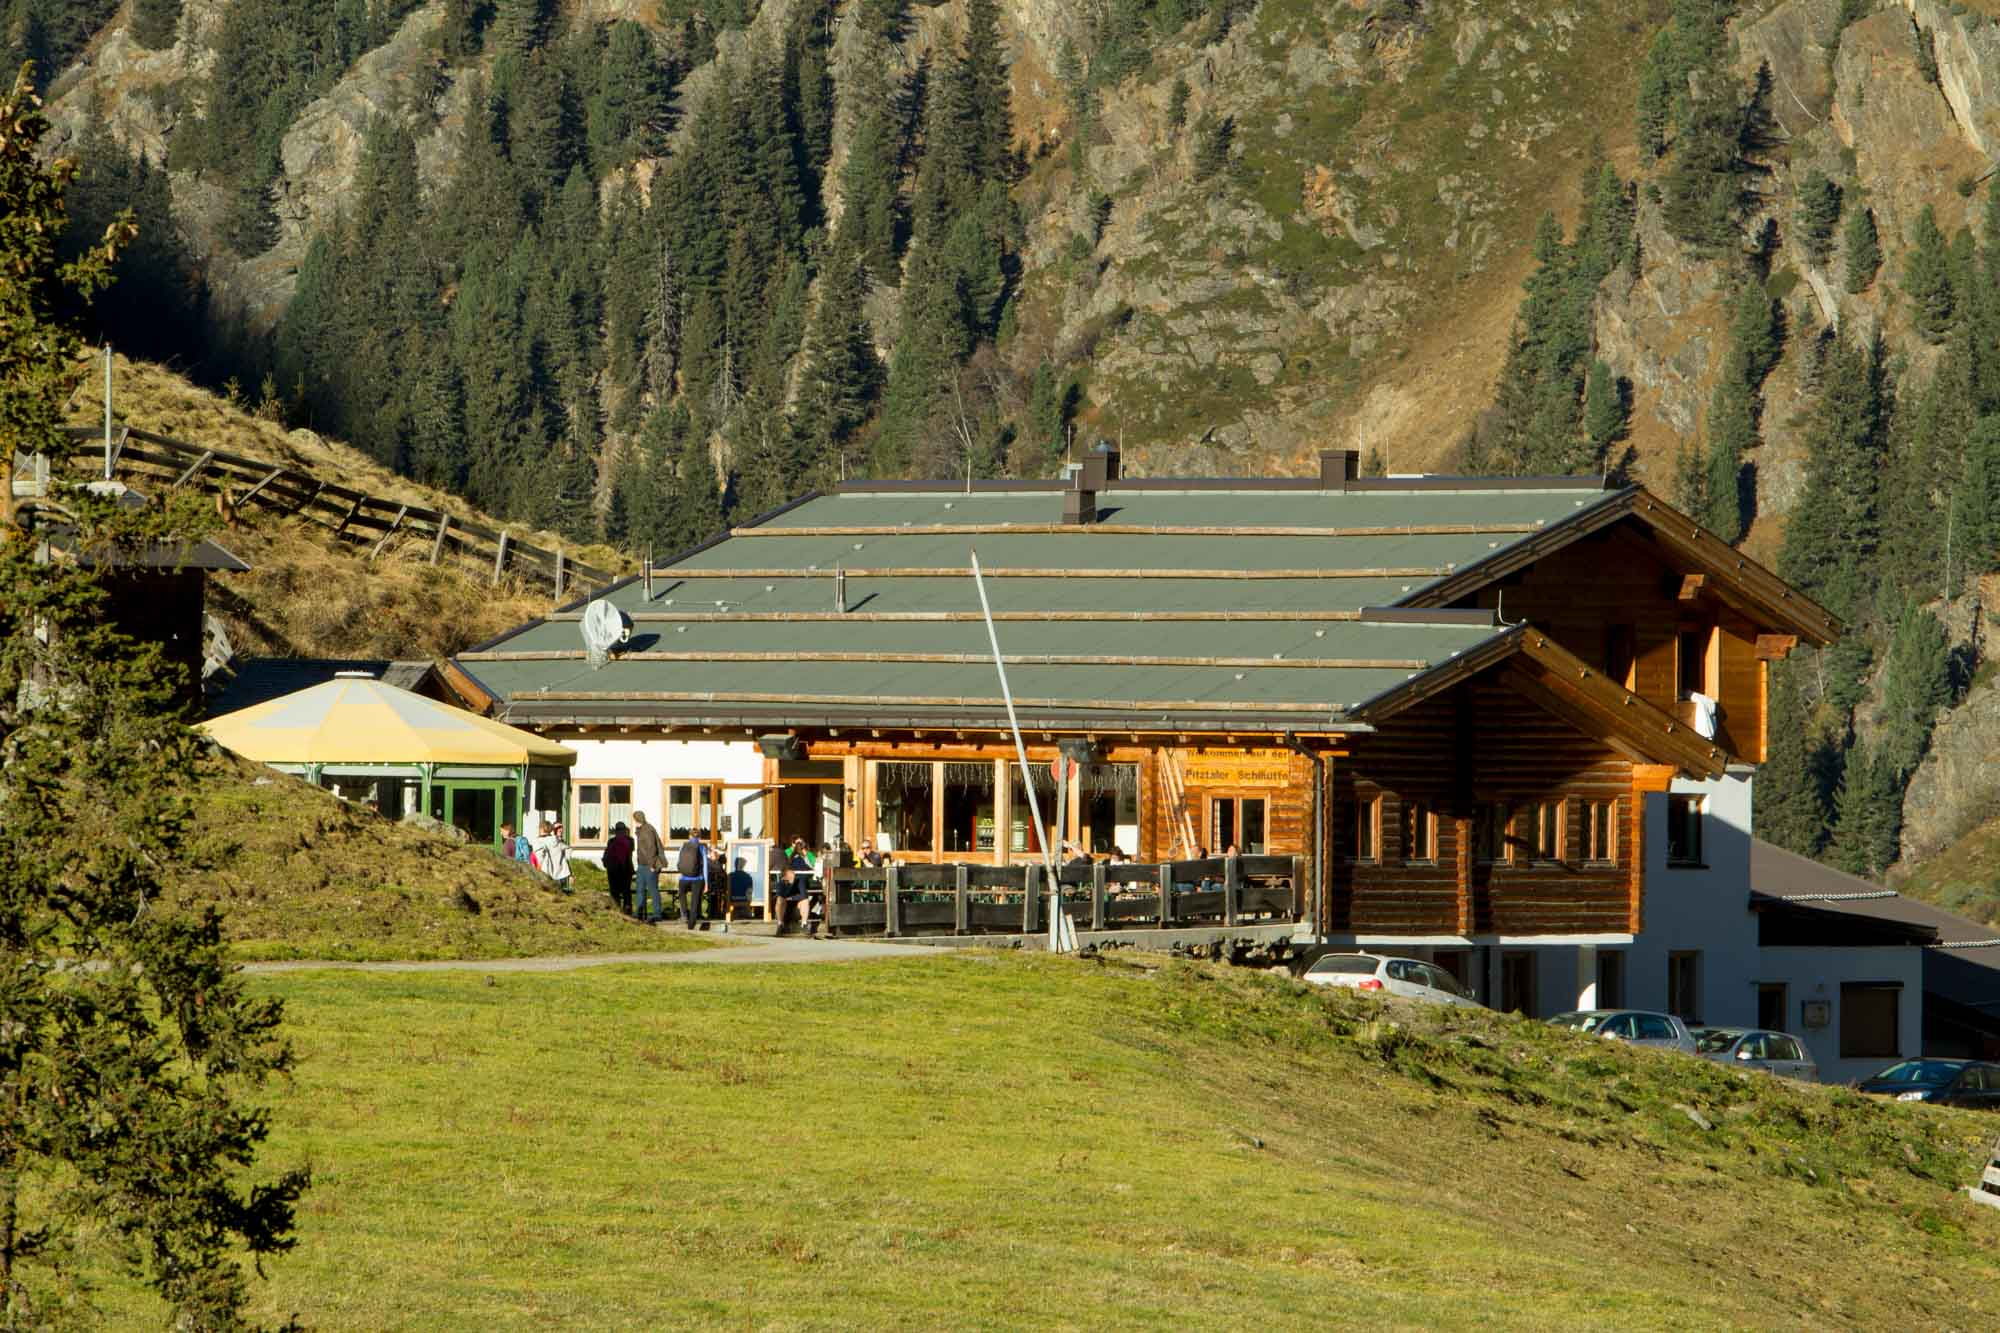 Pitztaler Schihütte